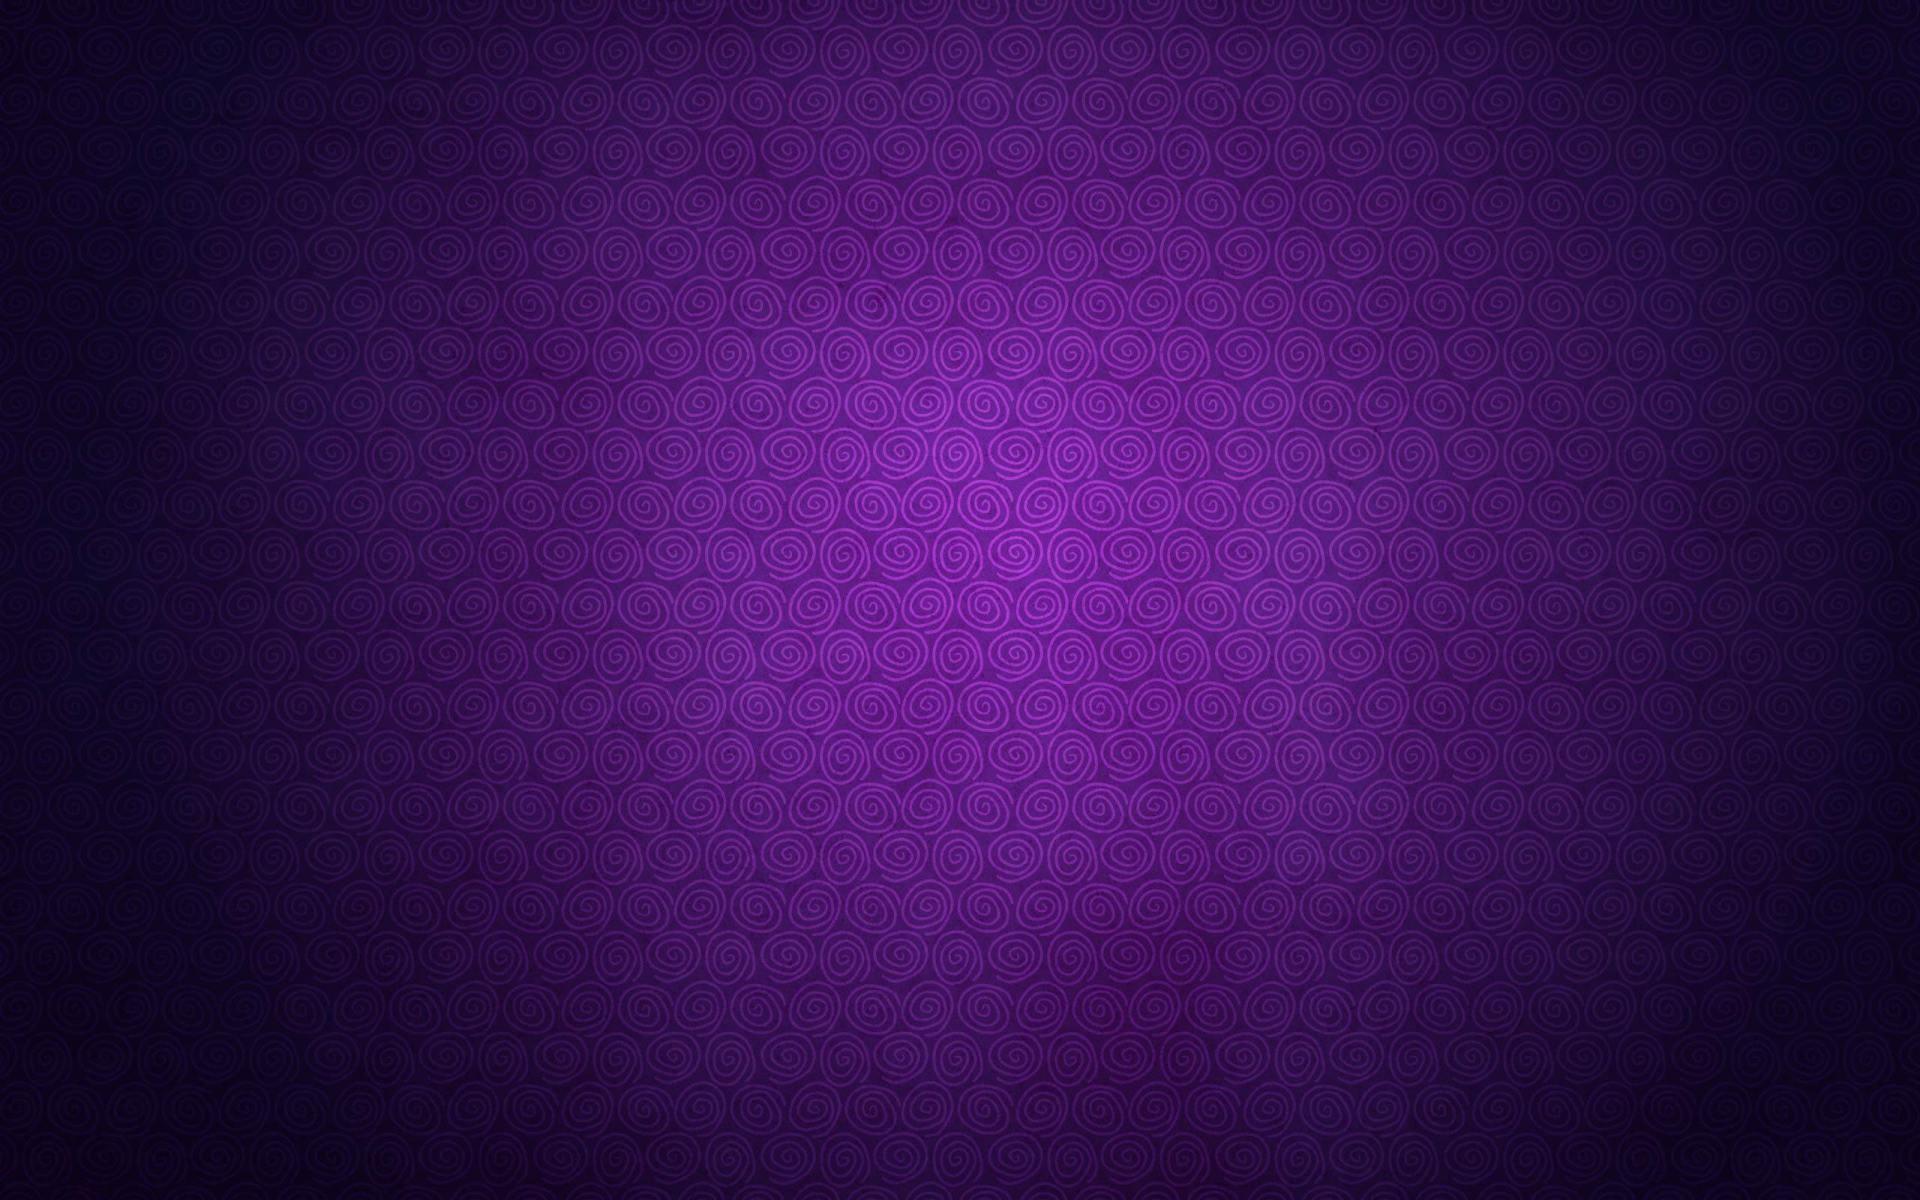 1920x1200 Purple Background Design Wallpaper HD Download